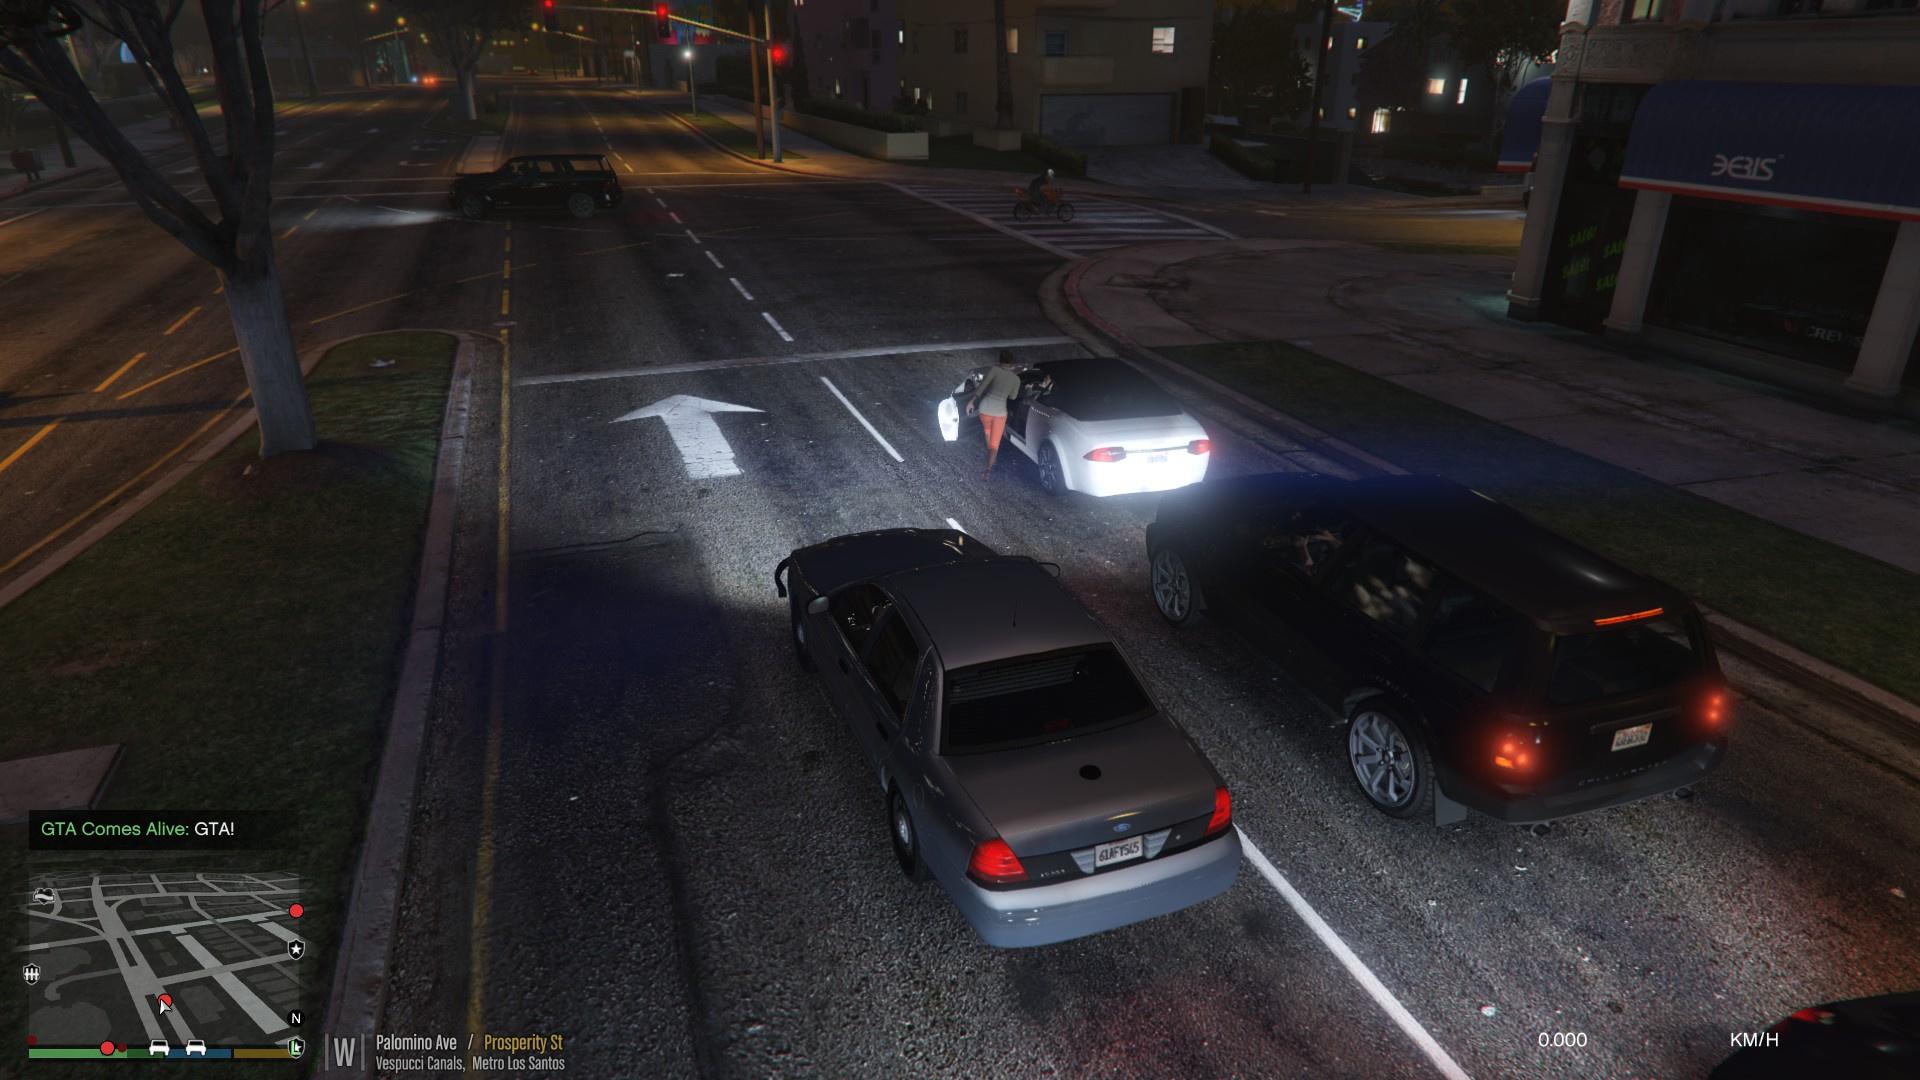 LSPDFR] Search Warrant - GTA5-Mods com